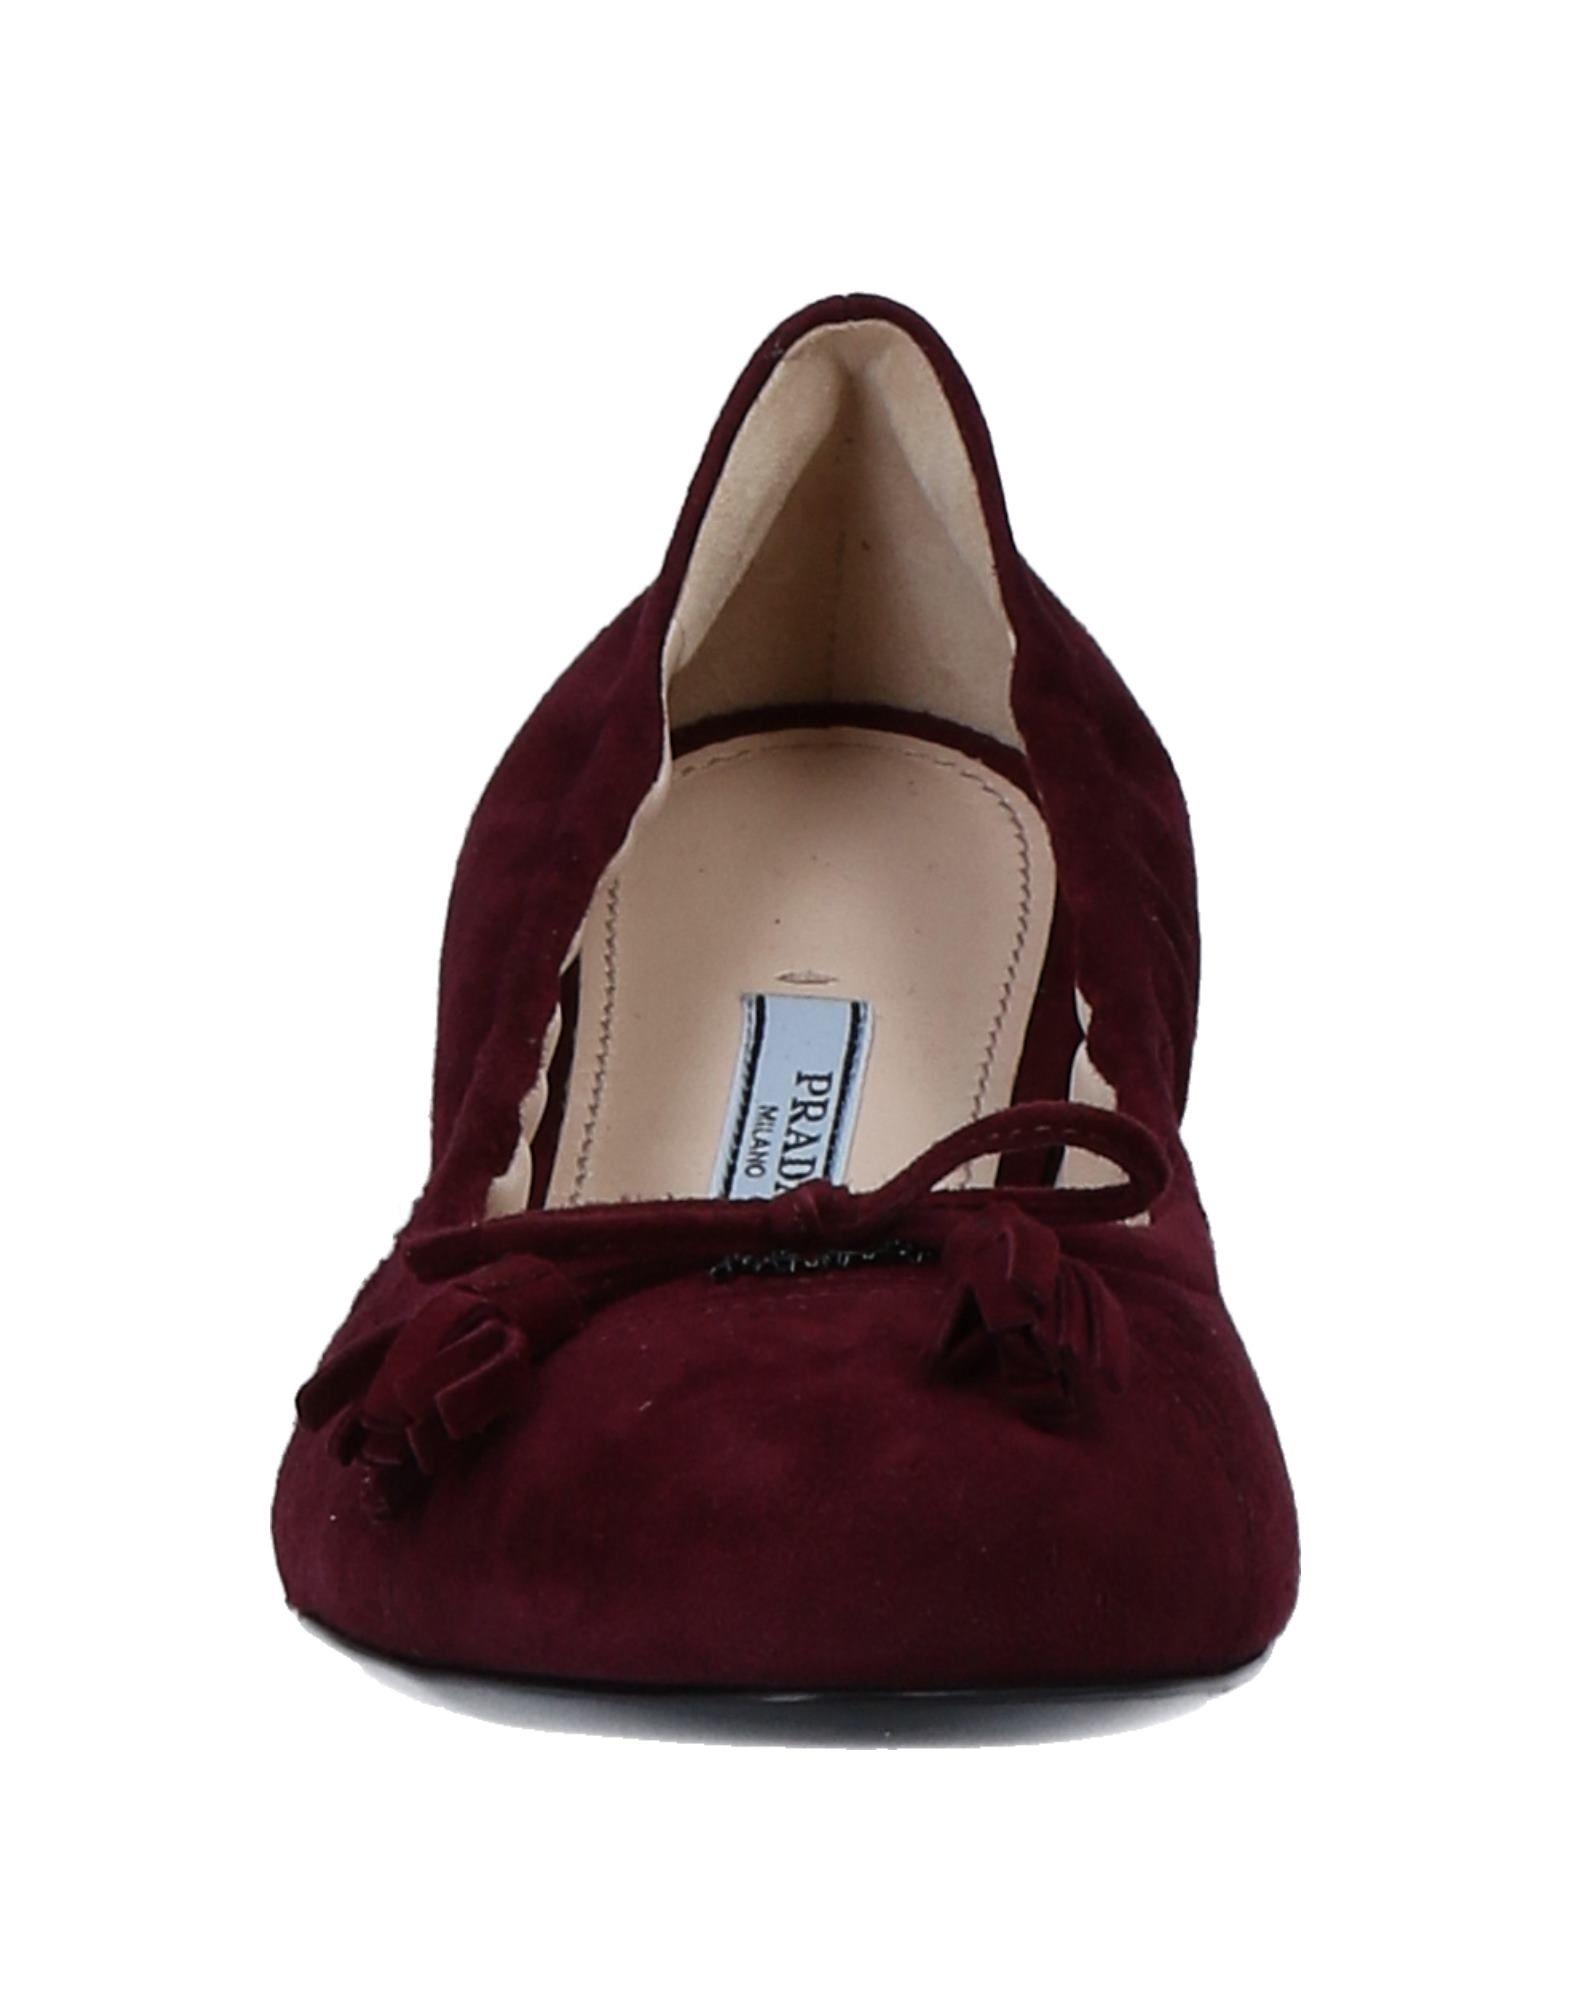 Rabatt Prada Schuhe Prada Rabatt Ballerinas Damen  11552519AW 420669